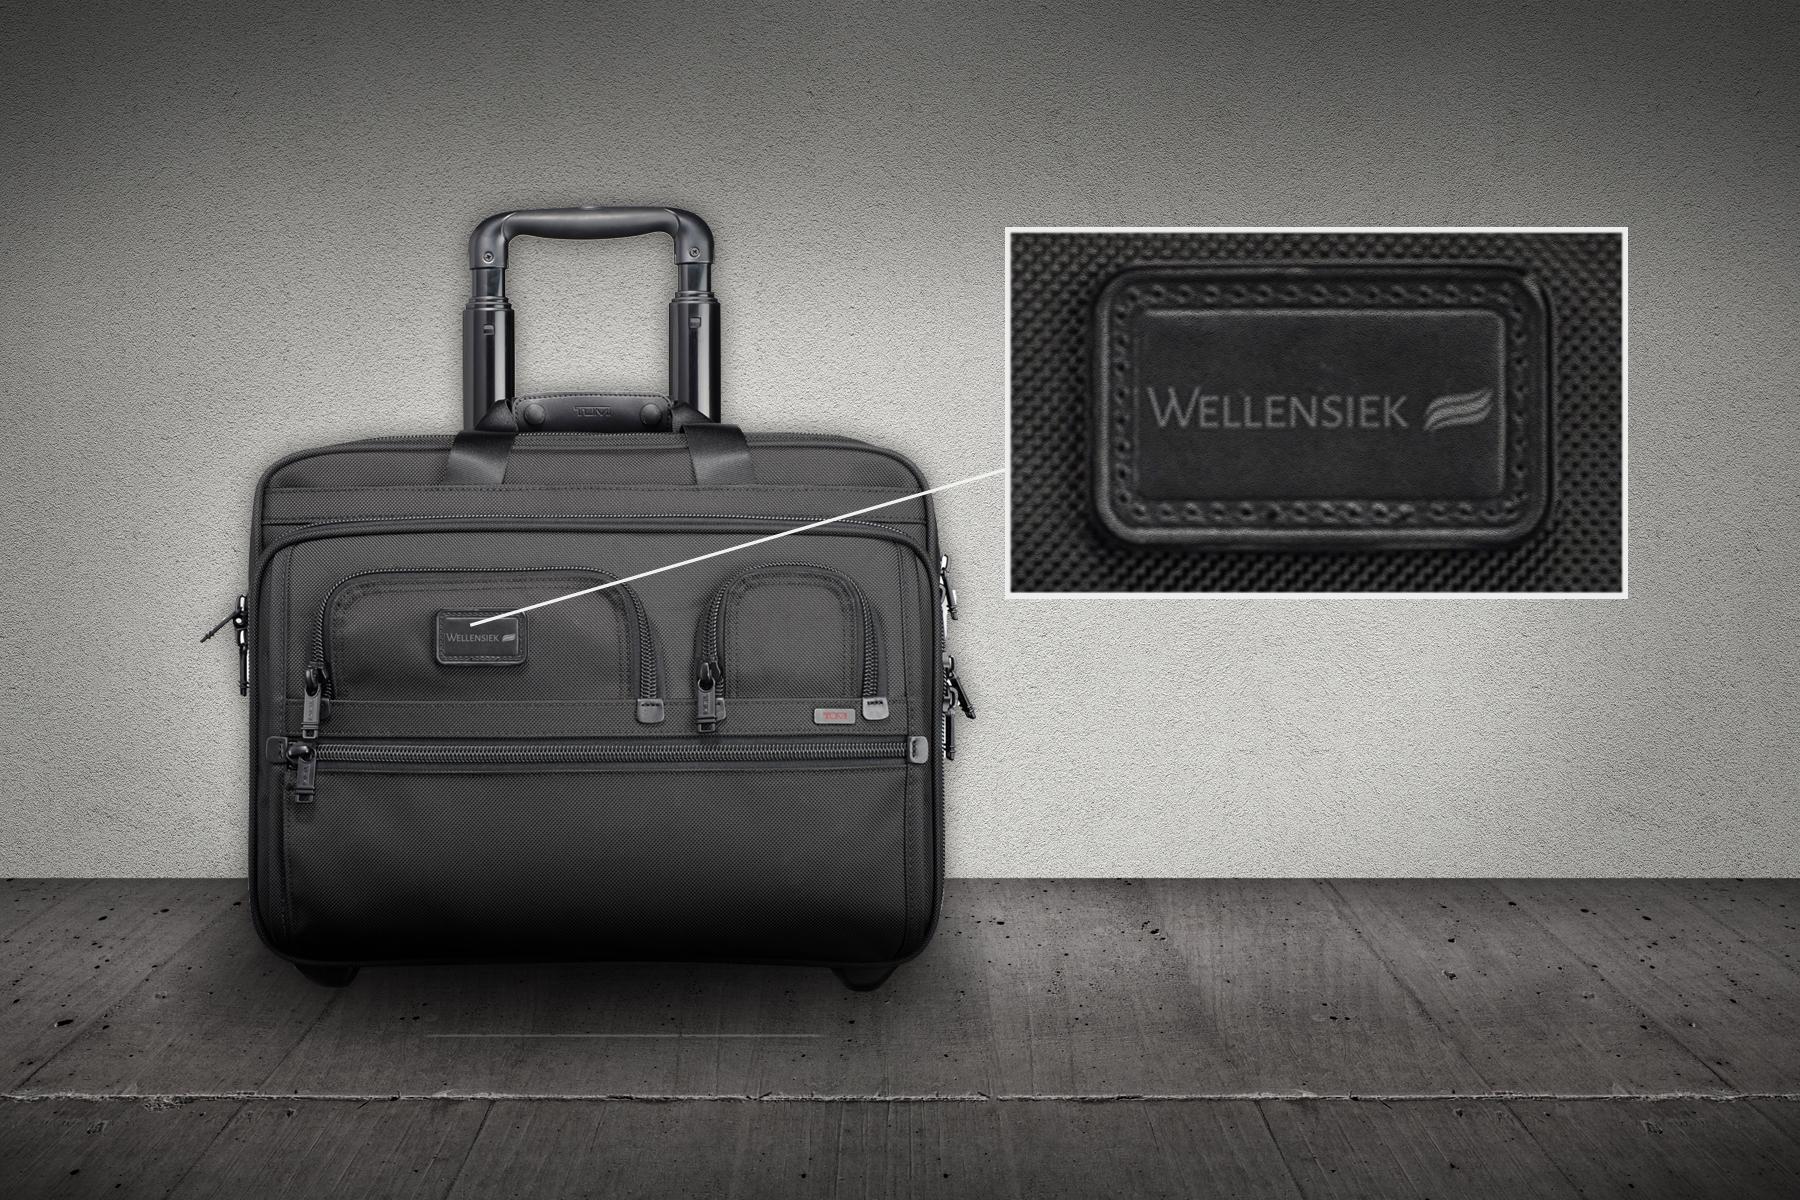 Business-Koffer mit Wellensiek-Label